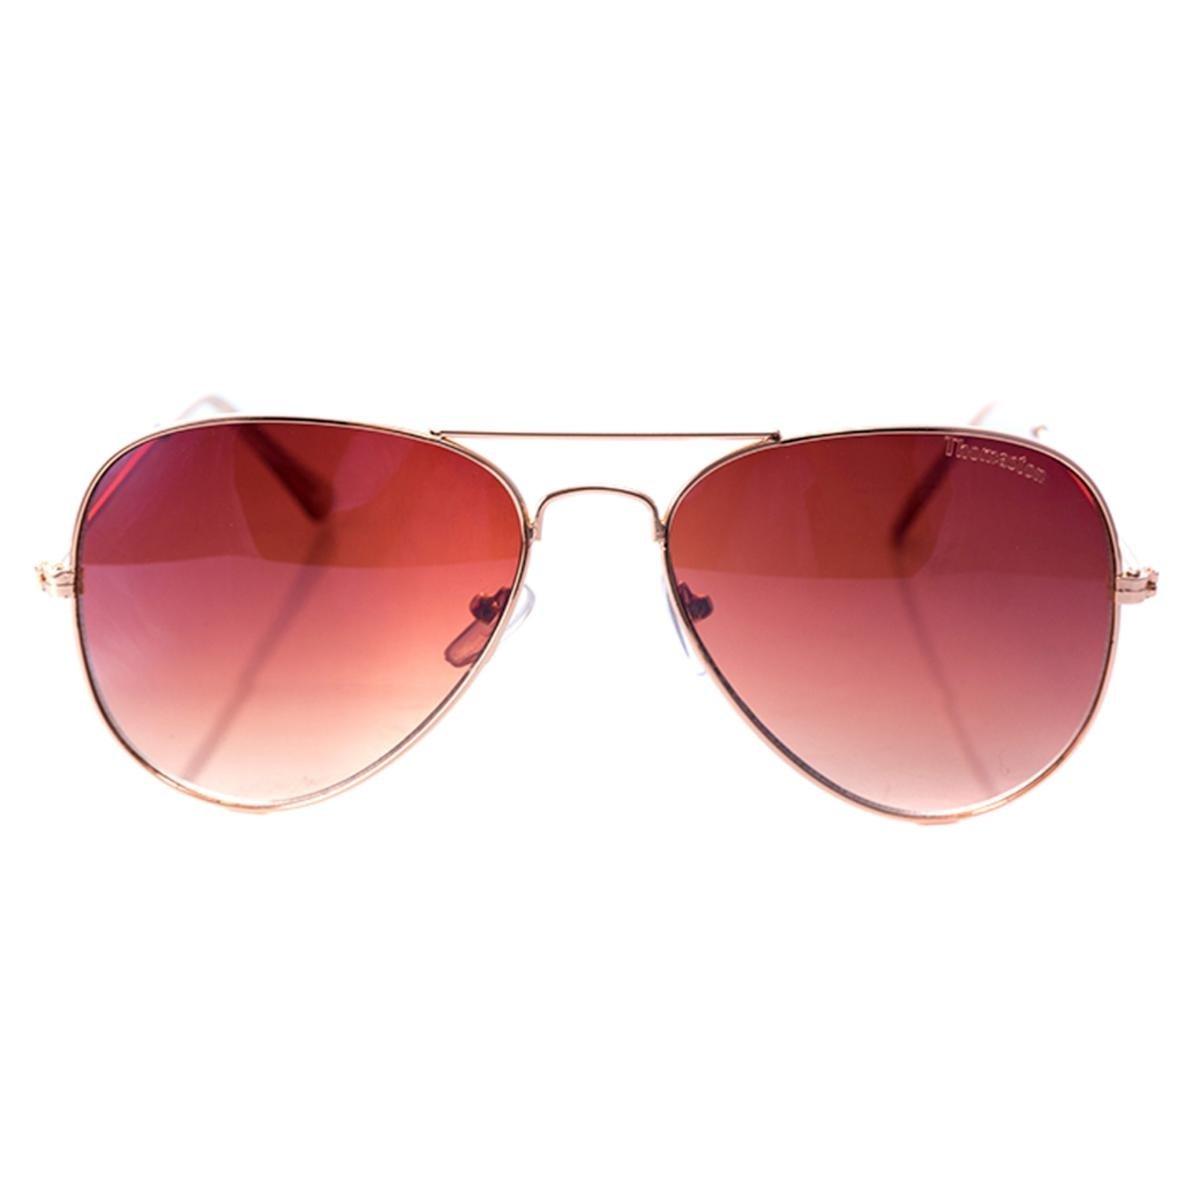 Óculos de Sol Thomaston Aviador Wheelsman - Incolor - Compre Agora ... 799b961077